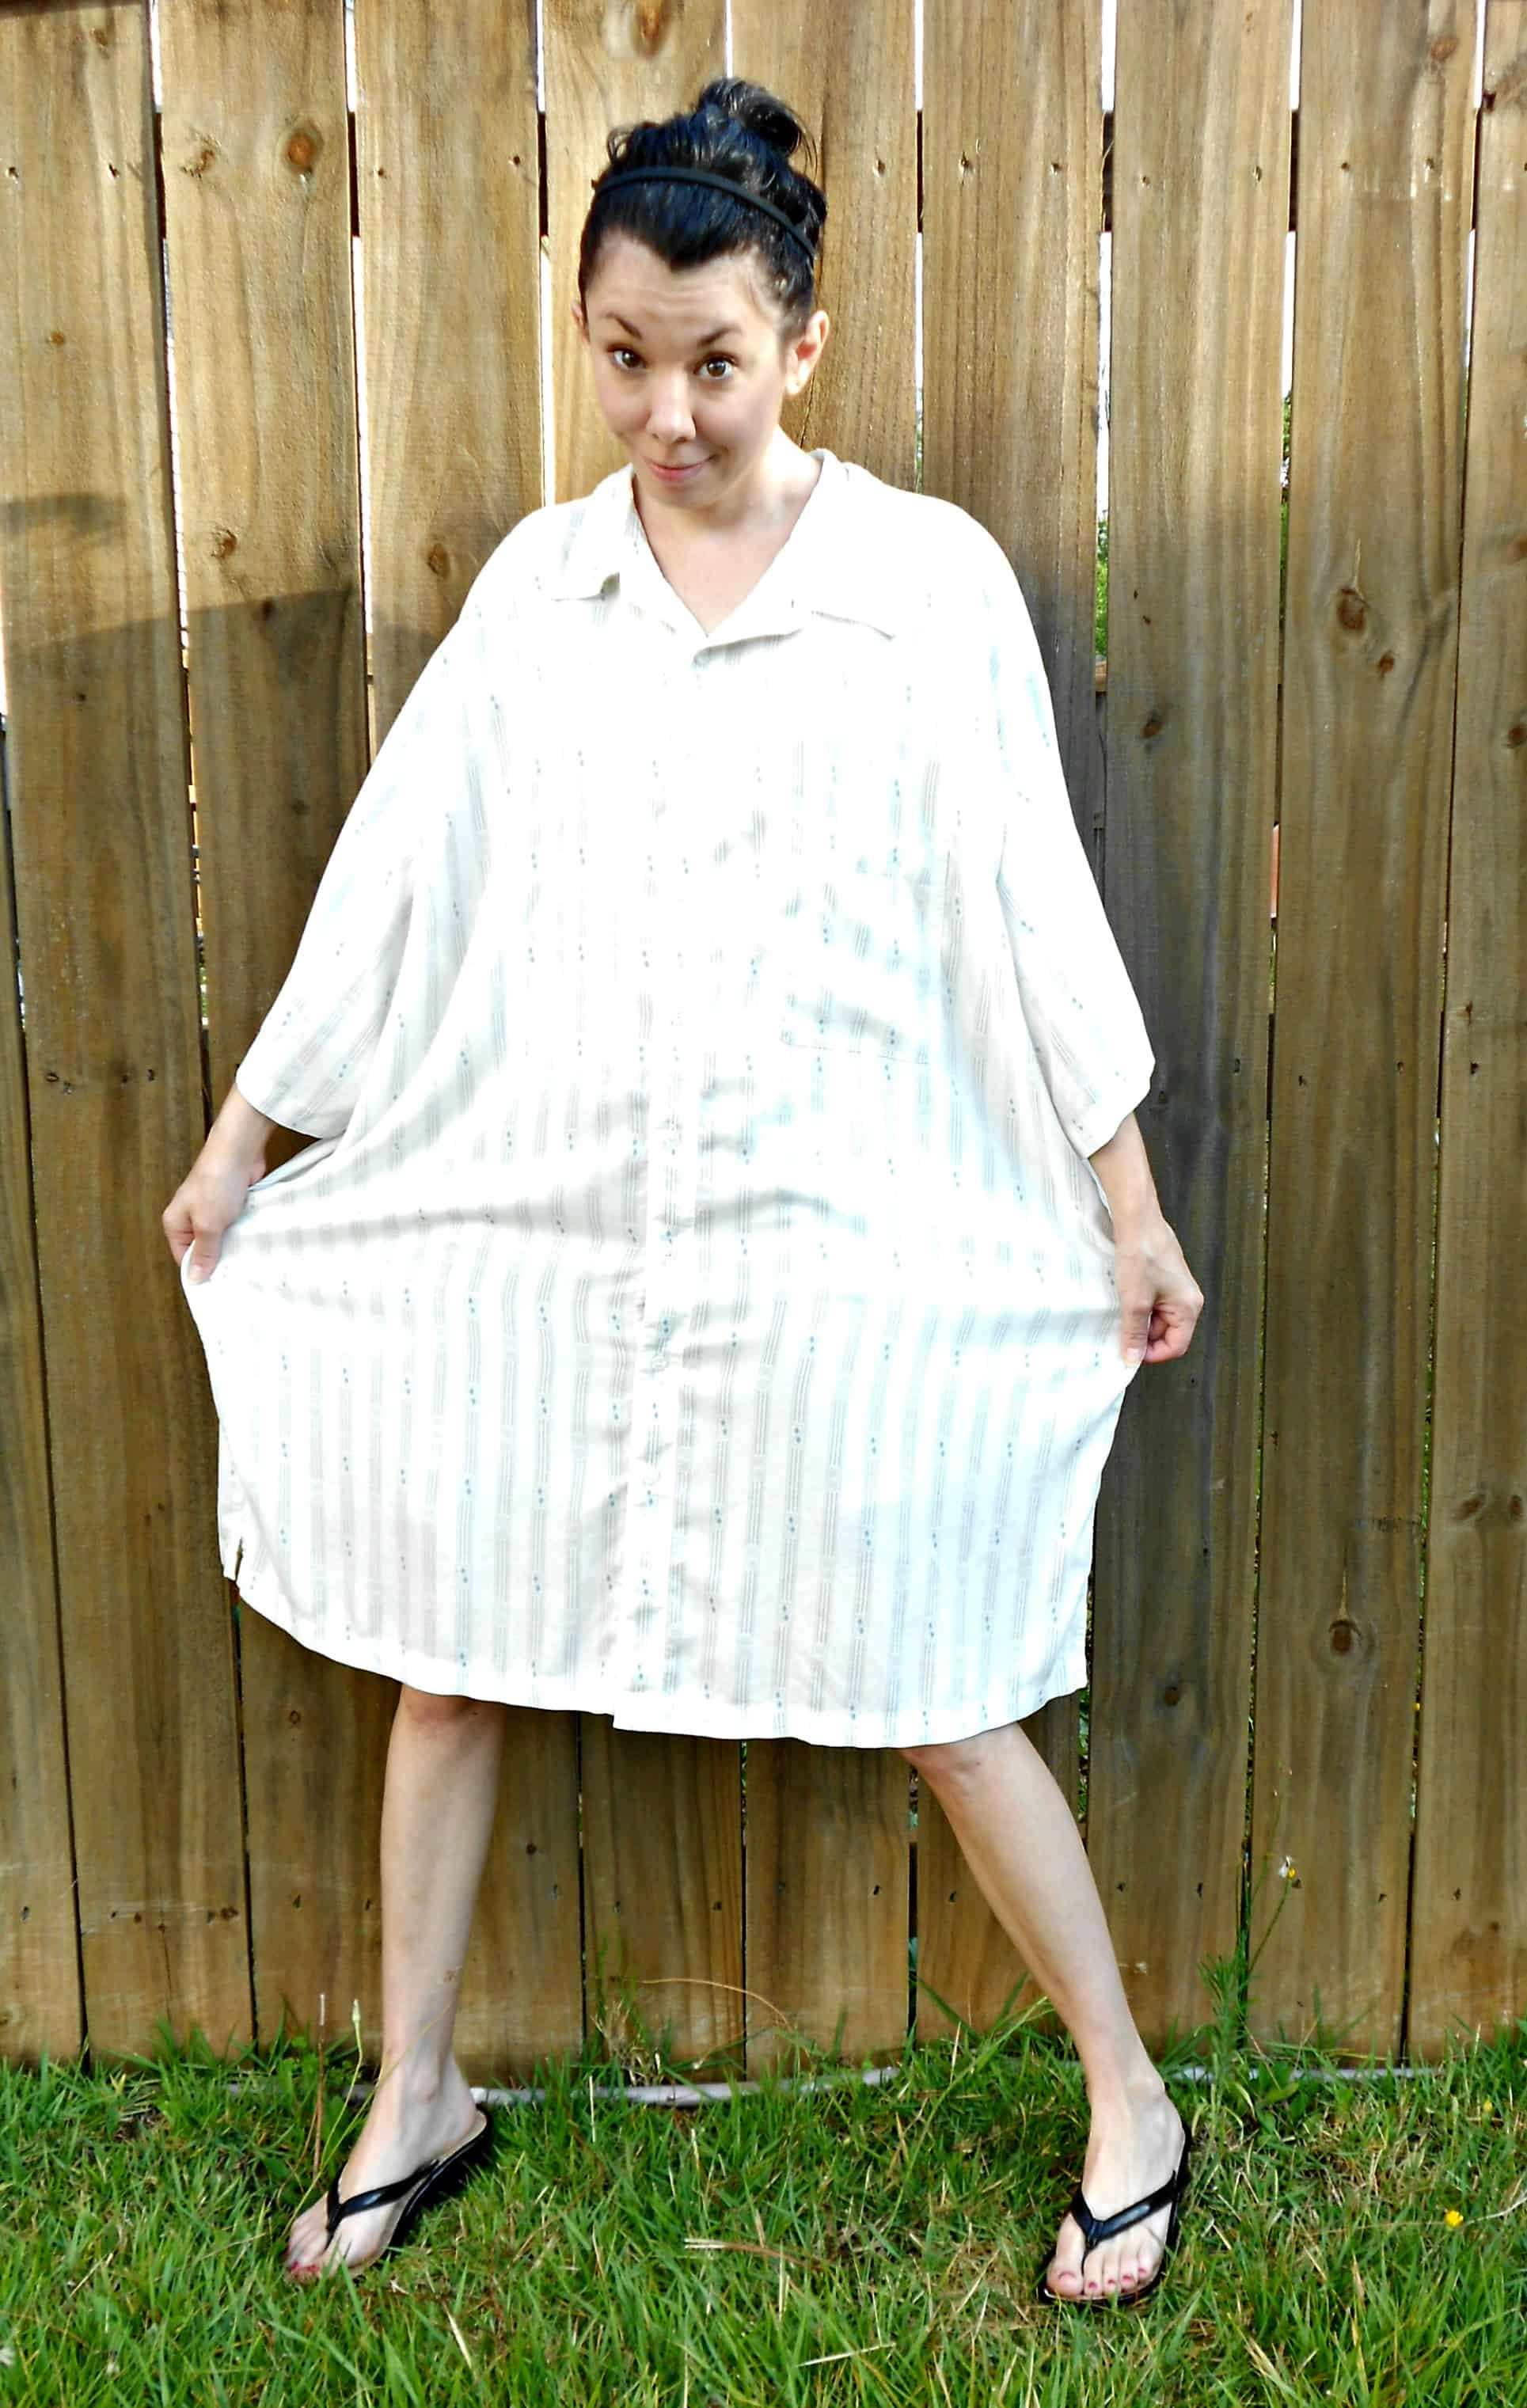 Day 360: A Spearmint Men's Shirt to Dress Refashion 5